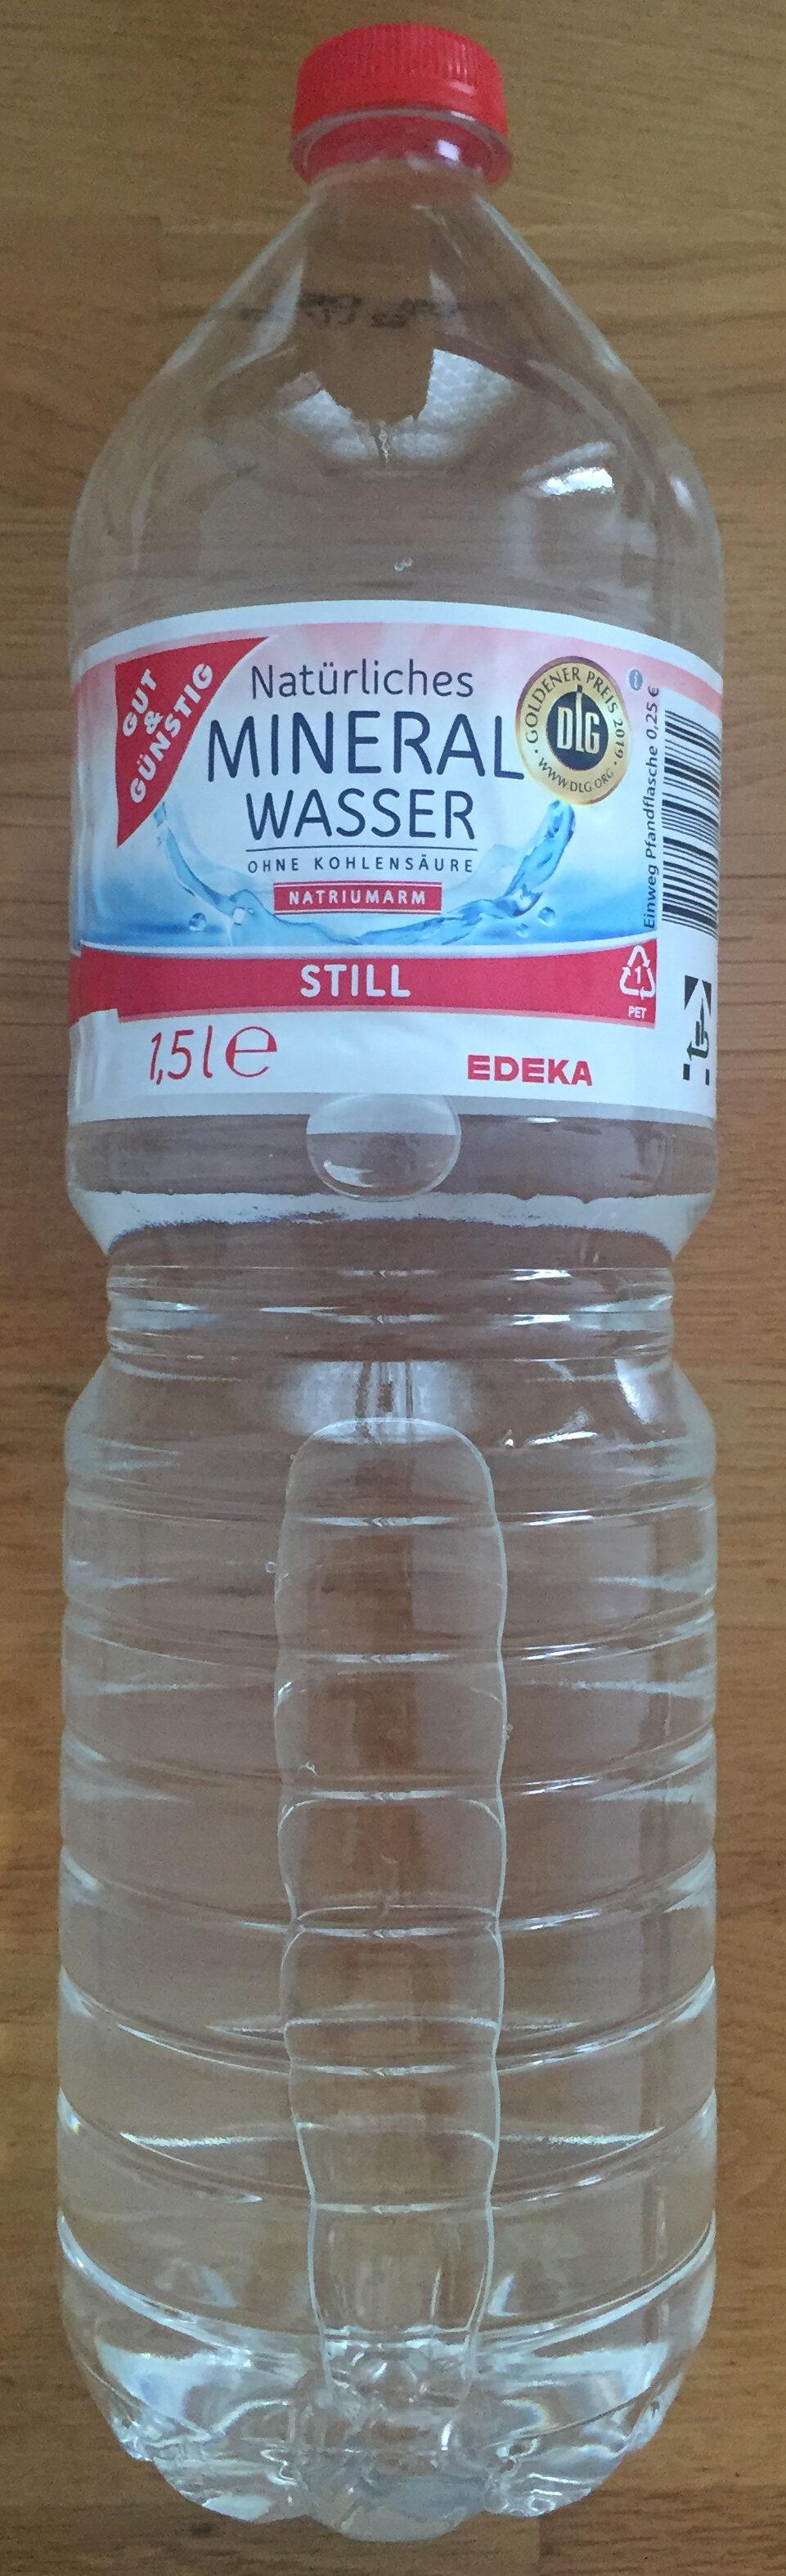 Mineral wasser - Produit - de